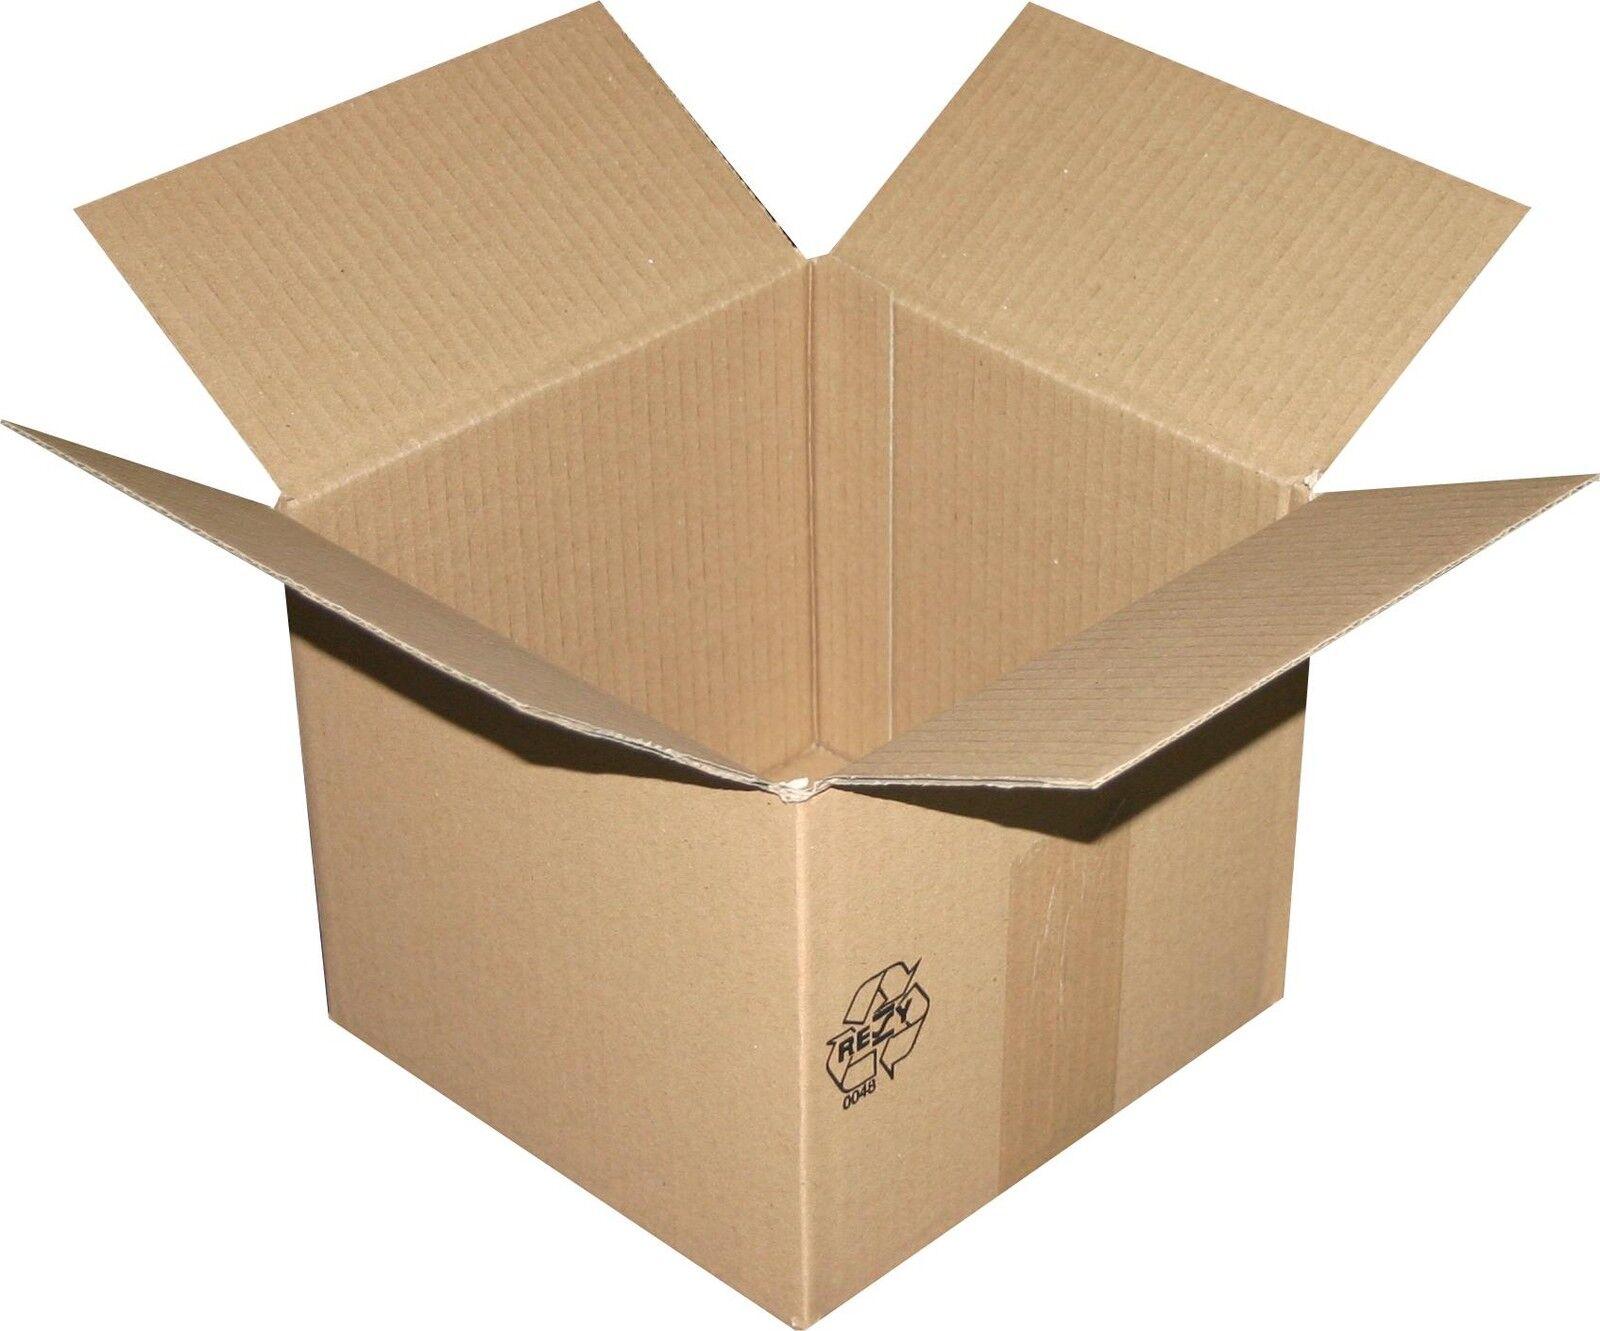 800 pièces cartons pliants, carton, Cartons 200x200x180 mm 1 1 1 ondulé 1cf1a2